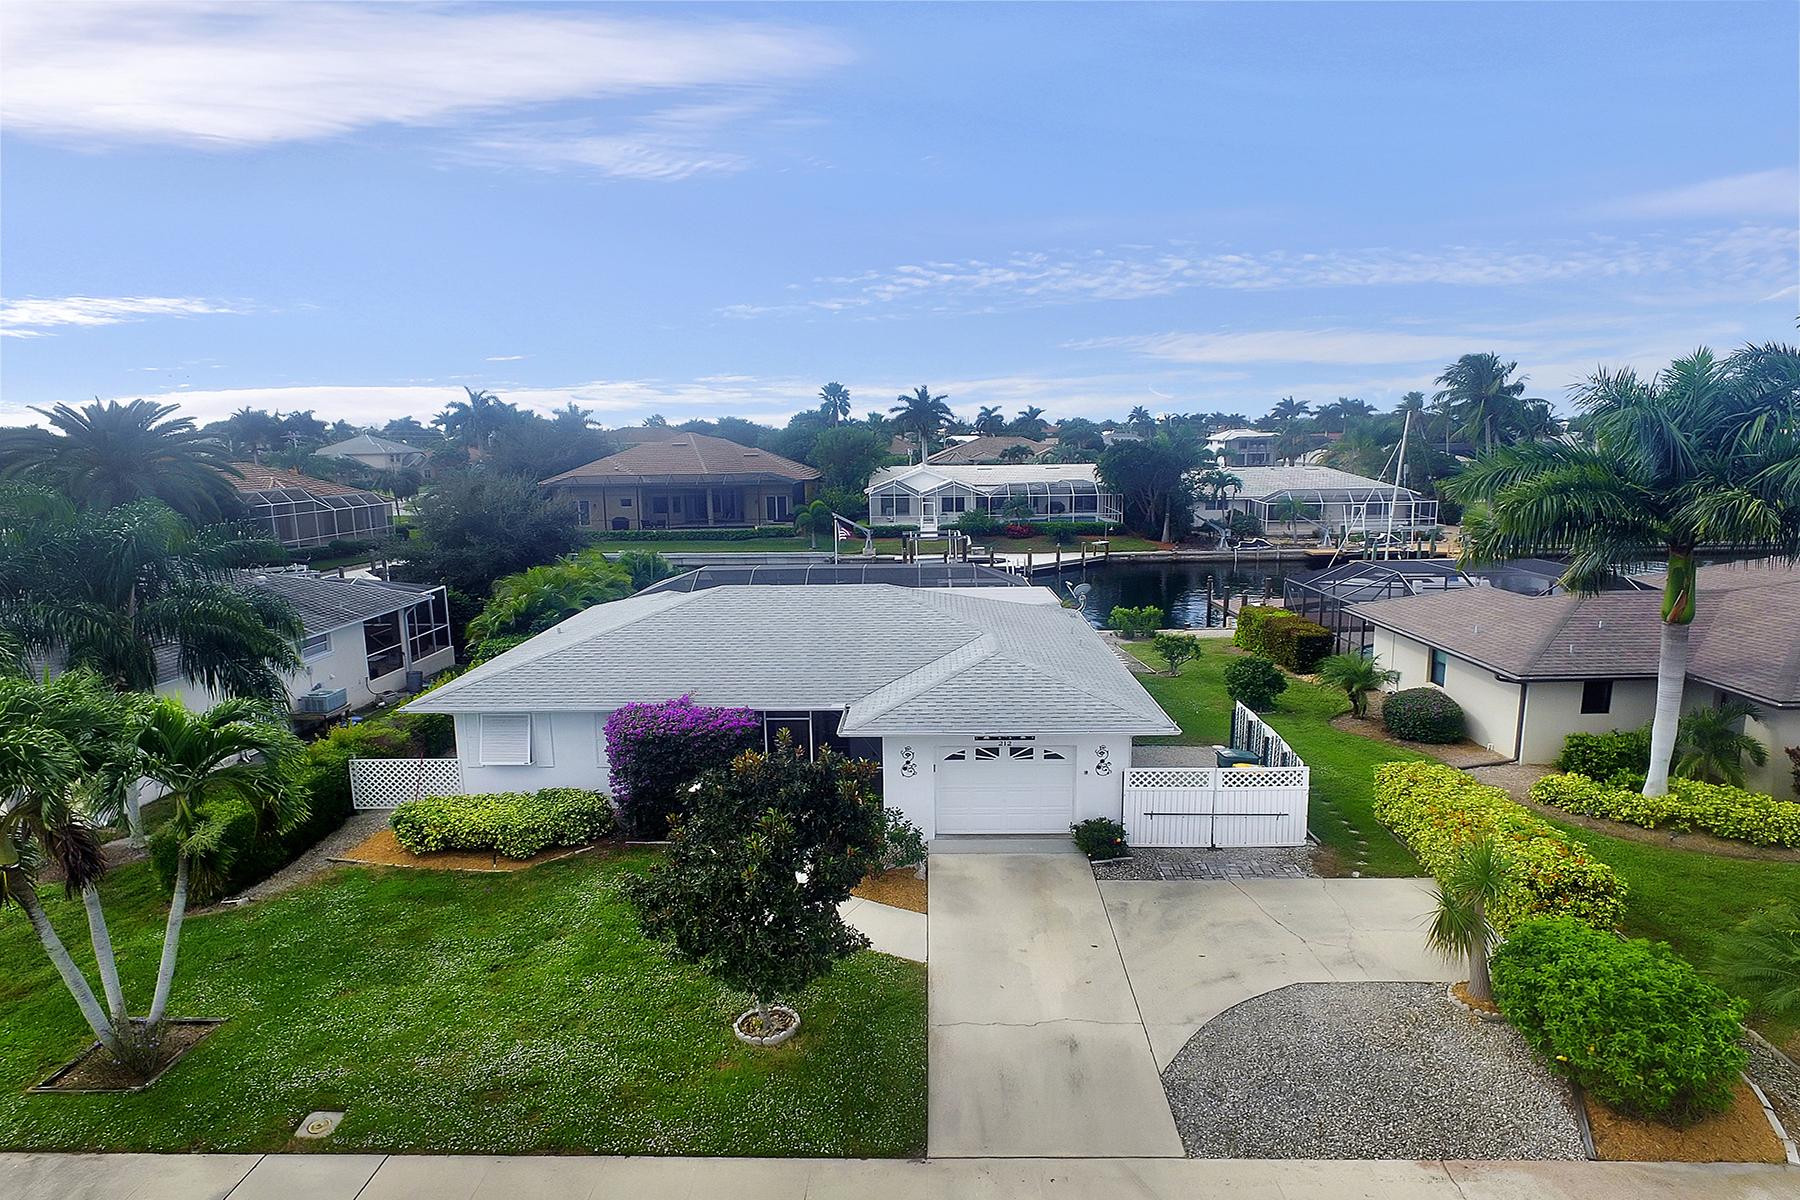 獨棟家庭住宅 為 出售 在 MARCO ISLAND 212 Angler Ct Marco Island, 佛羅里達州 34145 美國